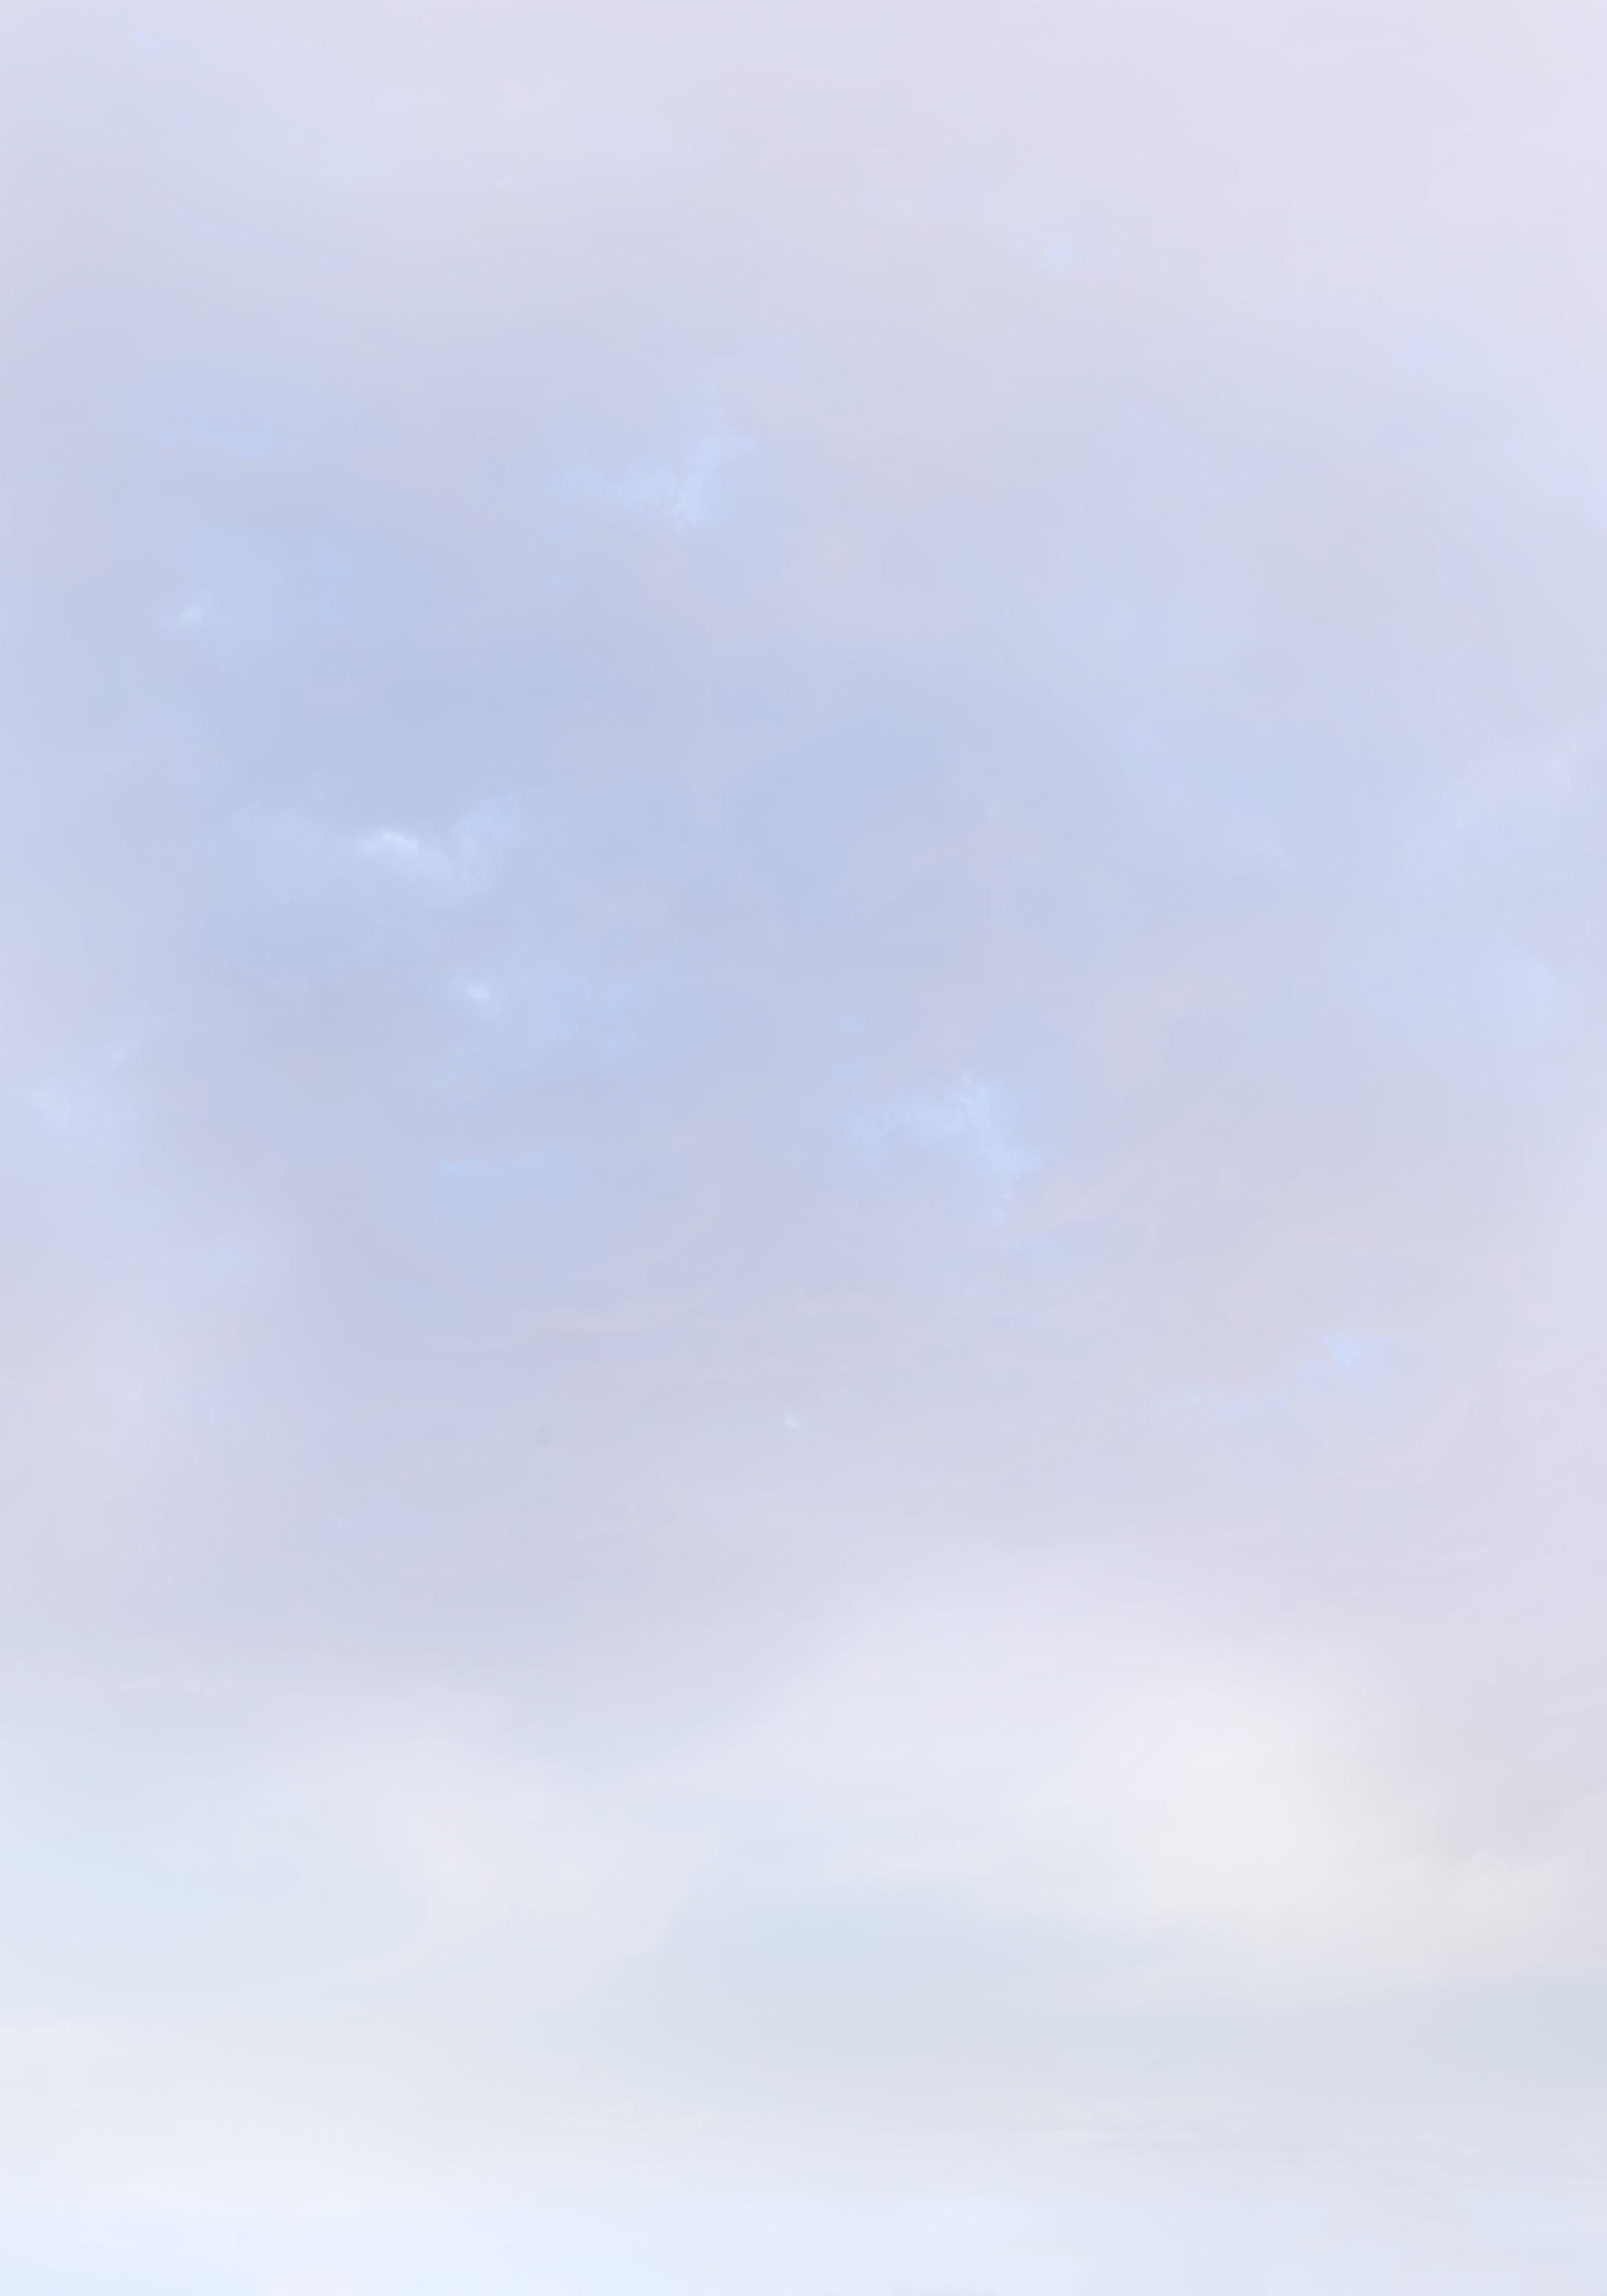 Ciel-ecole-nomade-vers2-OK.jpg